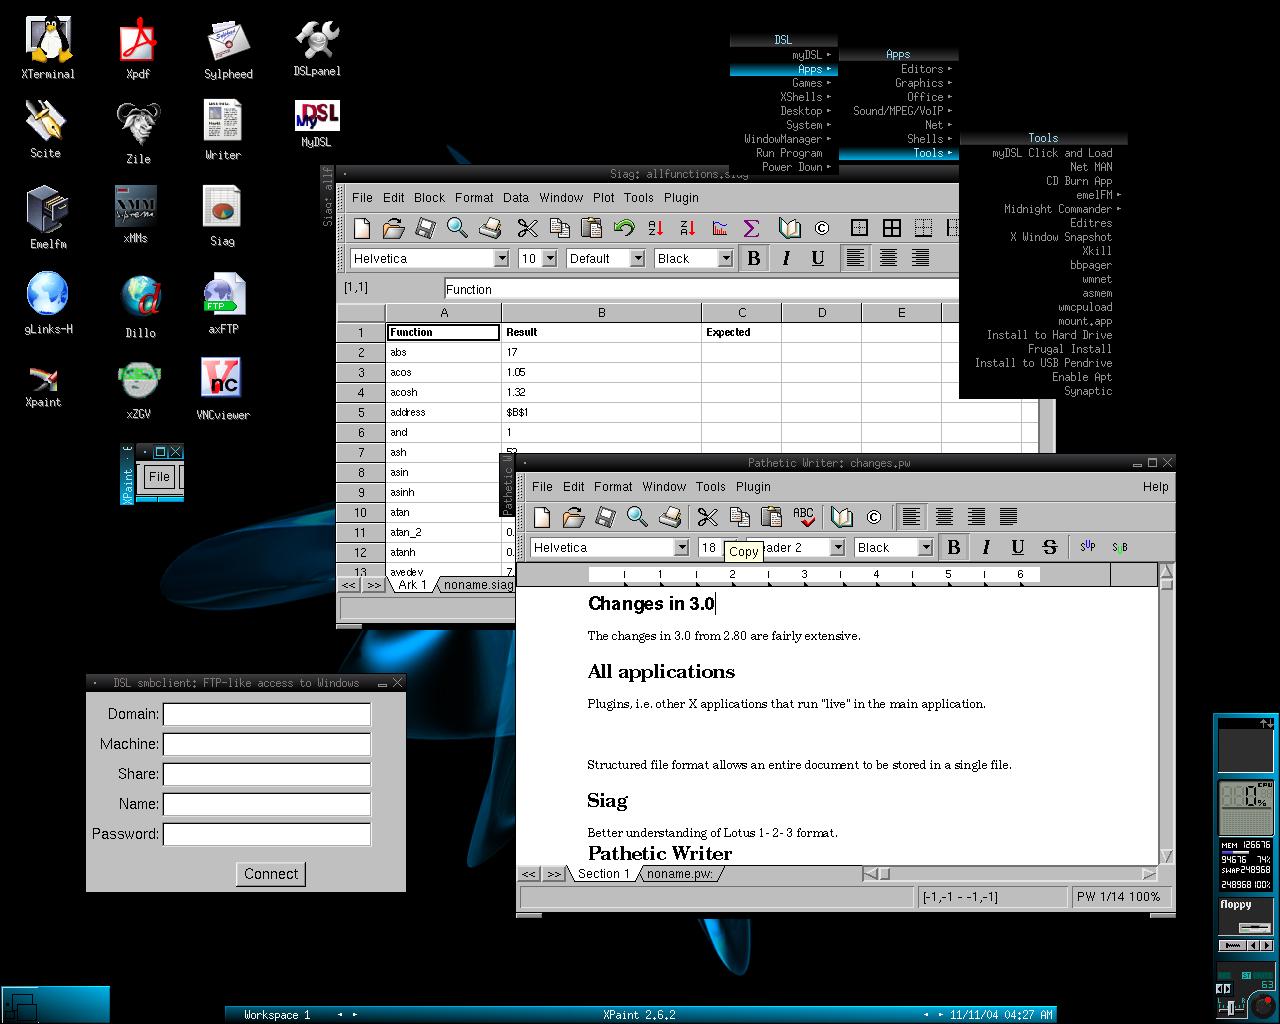 damn small linux установка на usb: